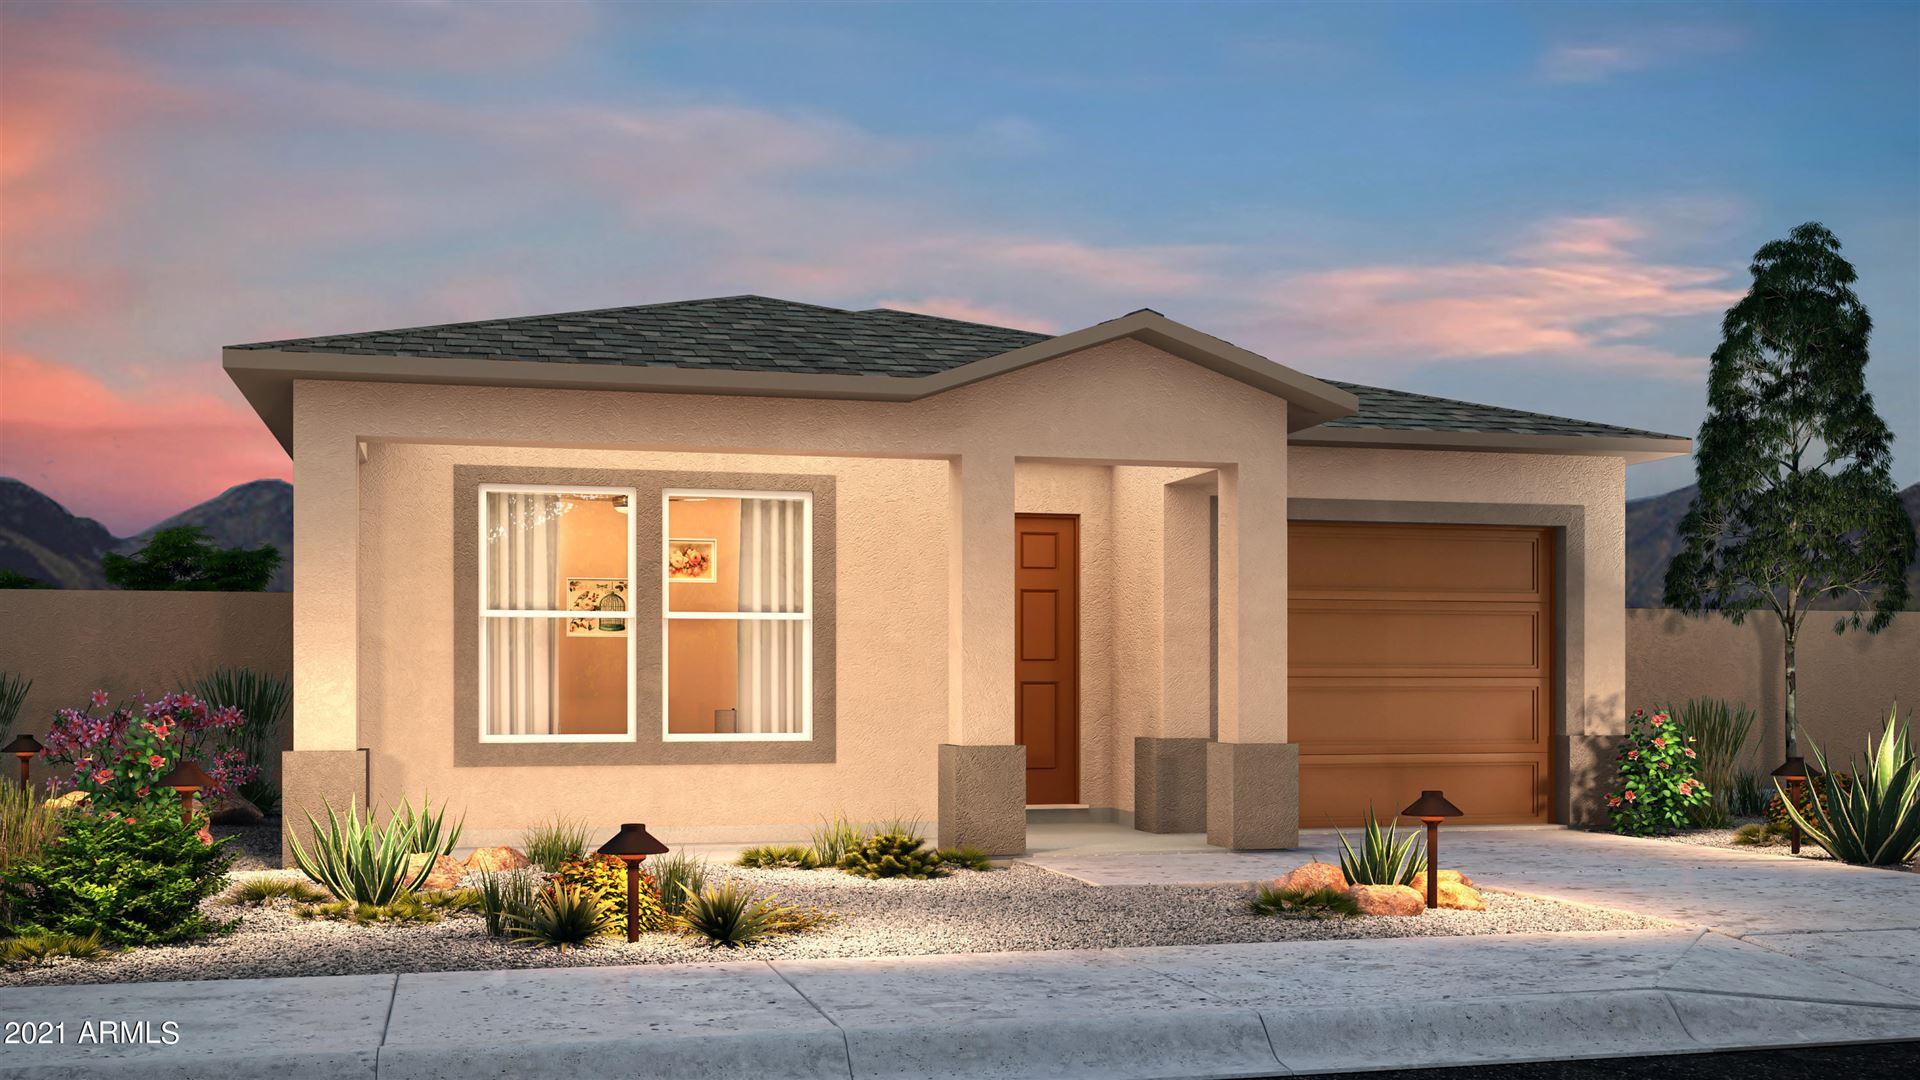 Photo of 192 Arkin Circle, Morristown, AZ 85342 (MLS # 6190351)